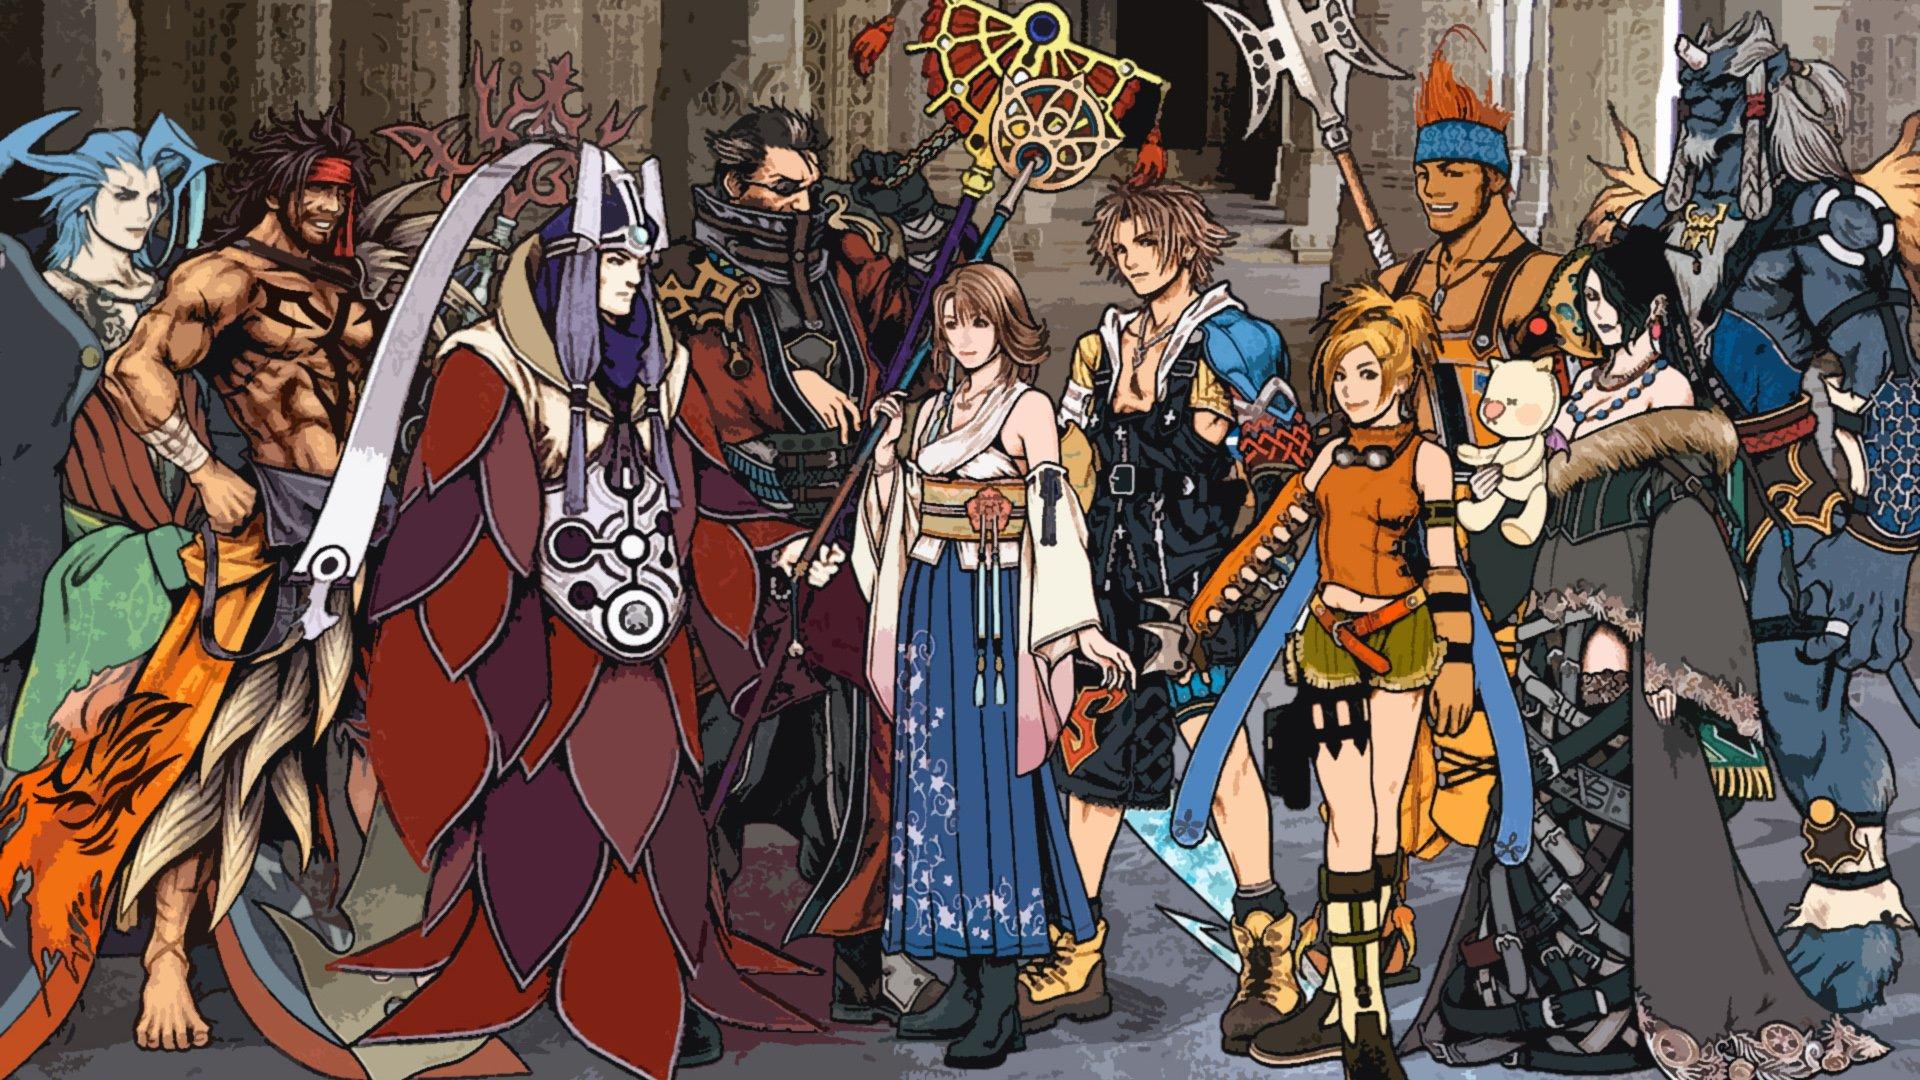 Final fantasy x hd wallpaper background image - Final fantasy 10 wallpaper 1920x1080 ...